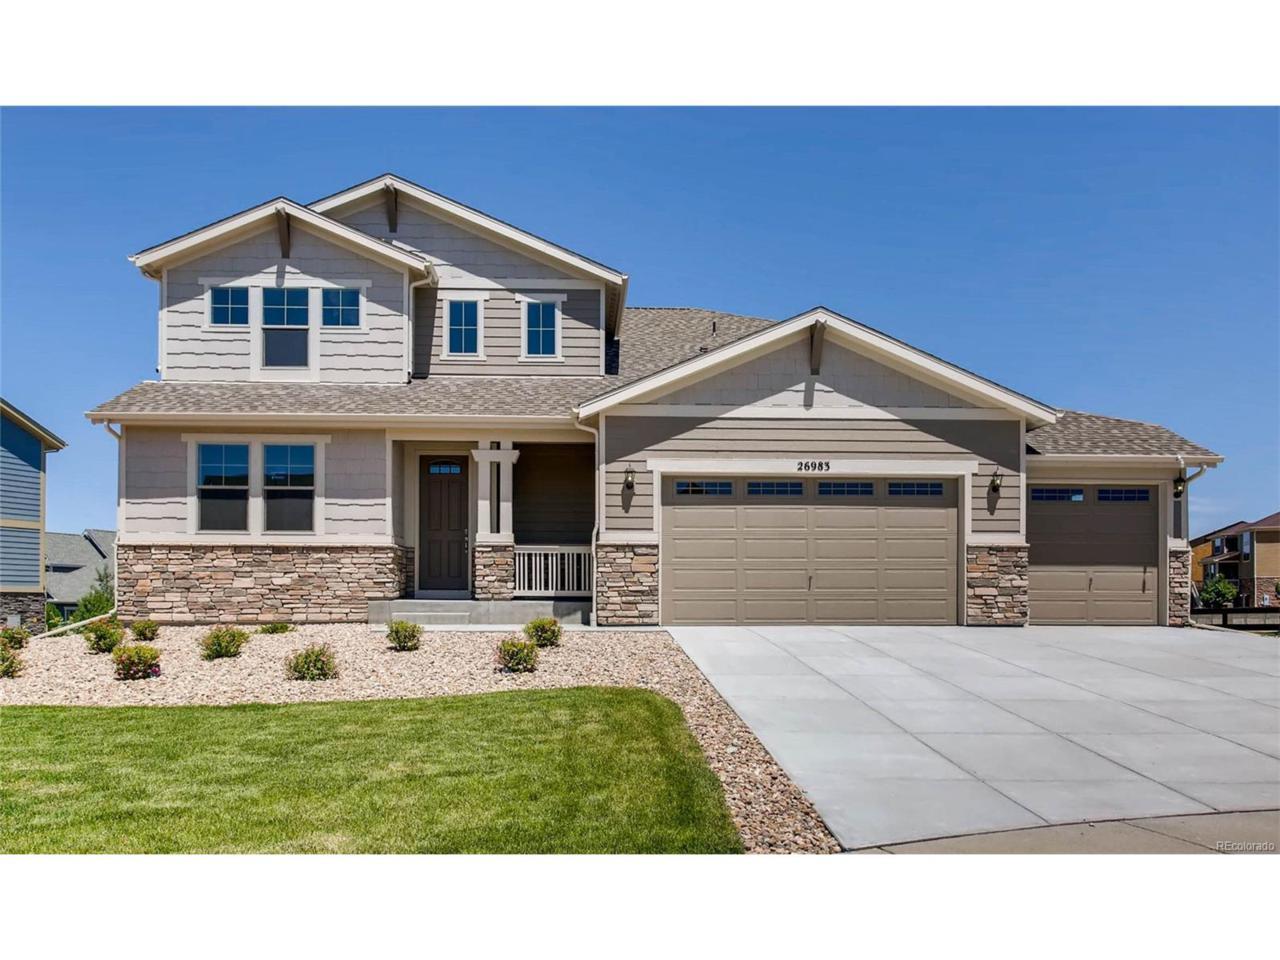 26983 E Ottawa Place, Aurora, CO 80016 (MLS #3357428) :: 8z Real Estate